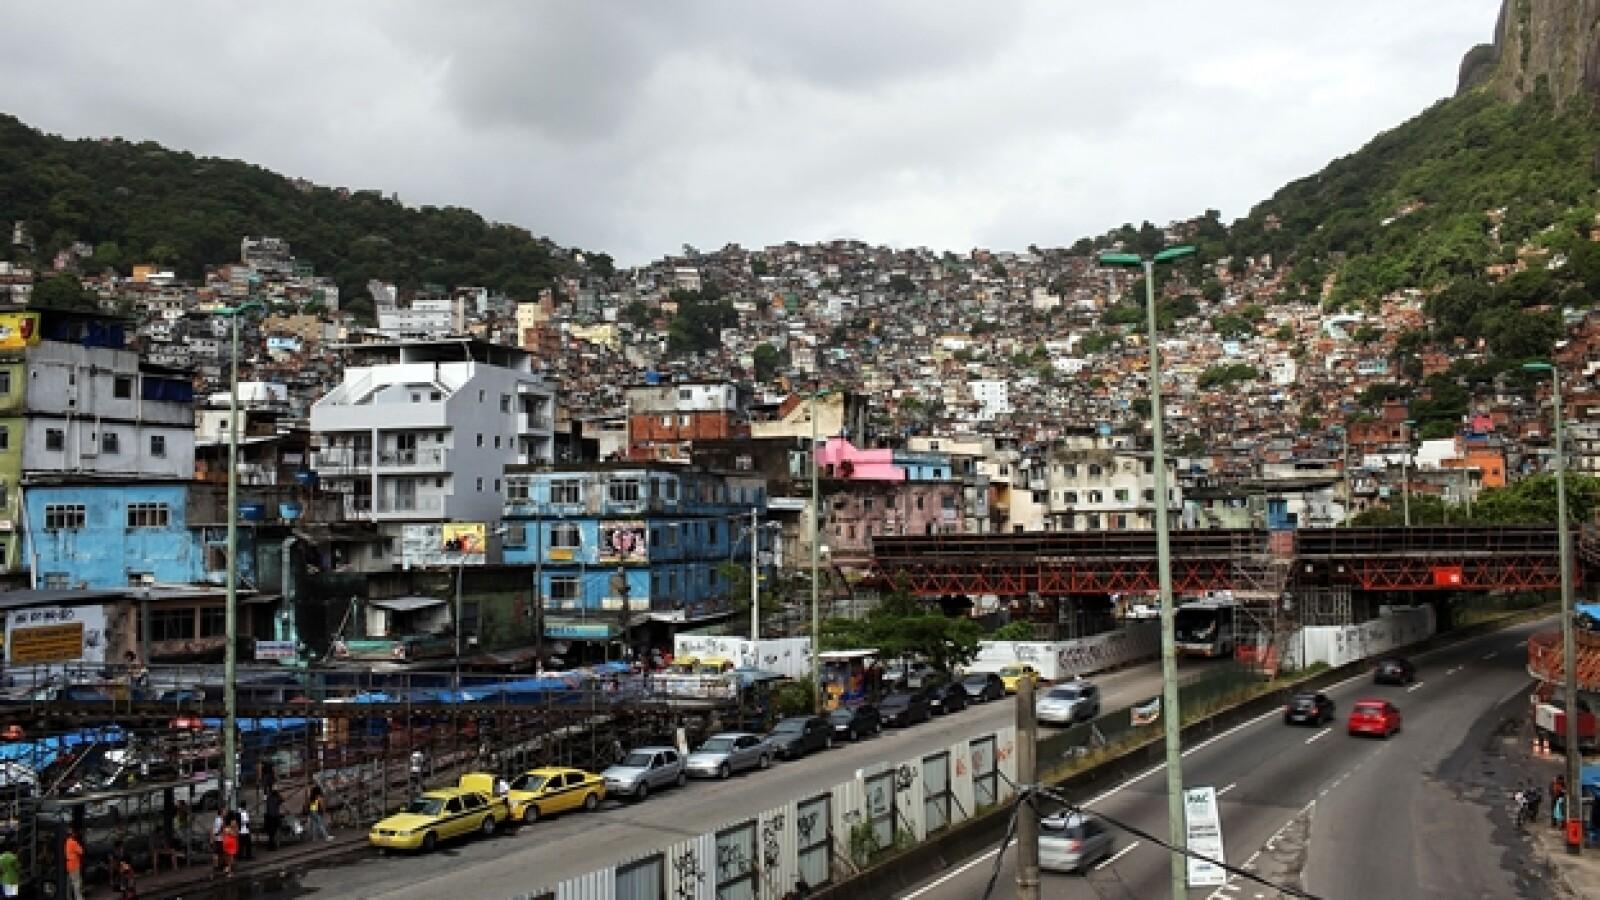 Brasil poblacion pobreza